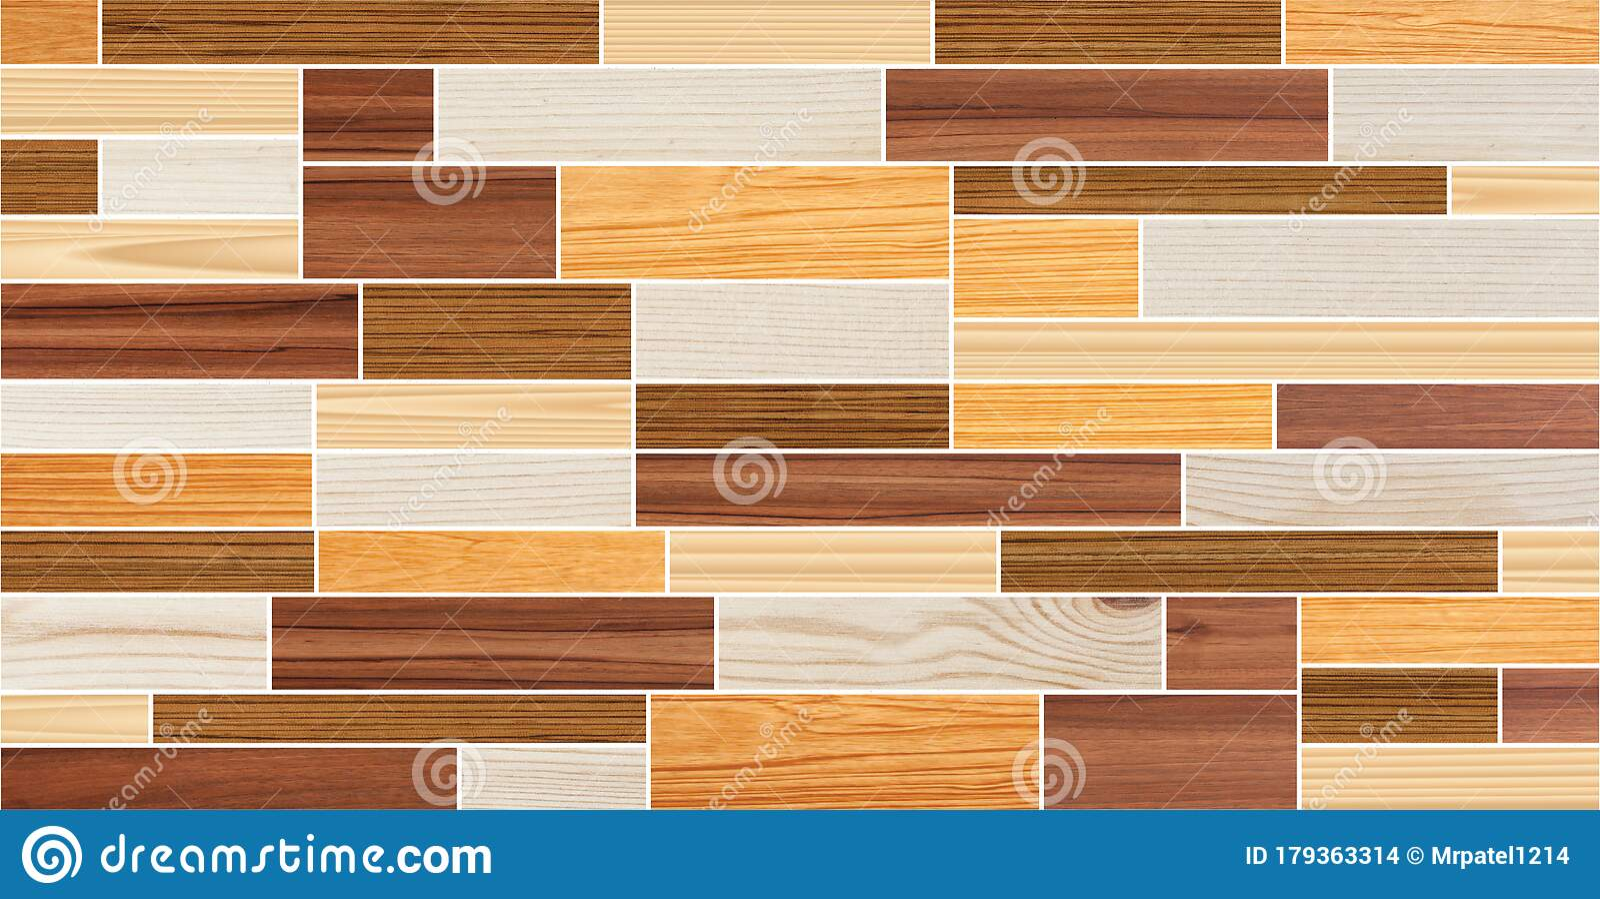 Seamless Wooden Wall Paneling Texture Stock Photo Image Of Modern Mosaic 179363314